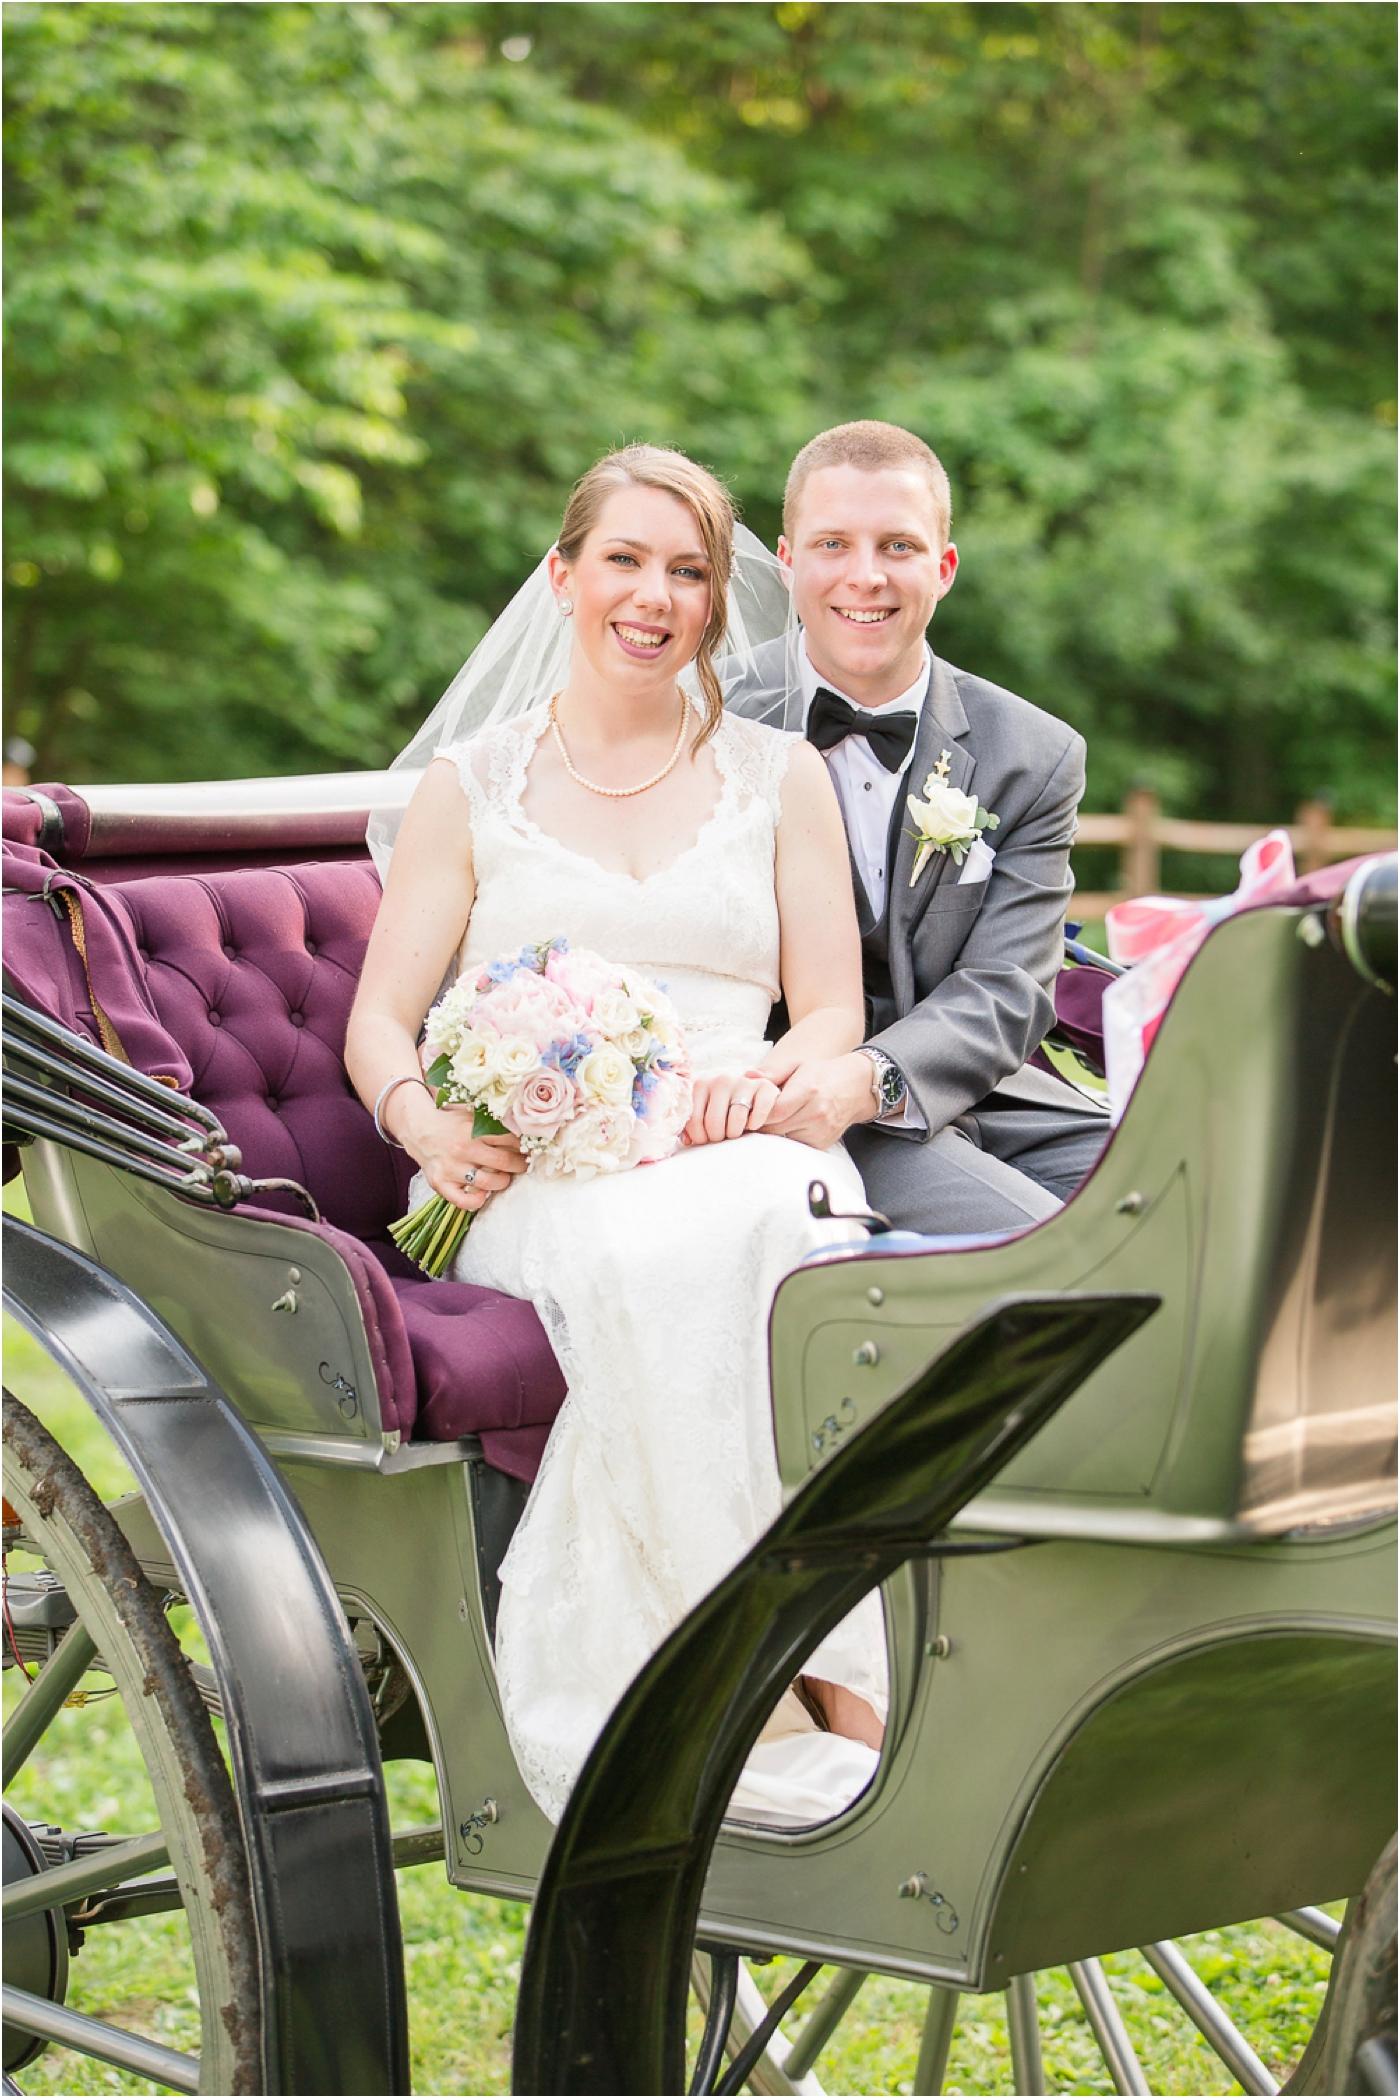 Gettysburg-lodges-wedding-photos-59.jpg